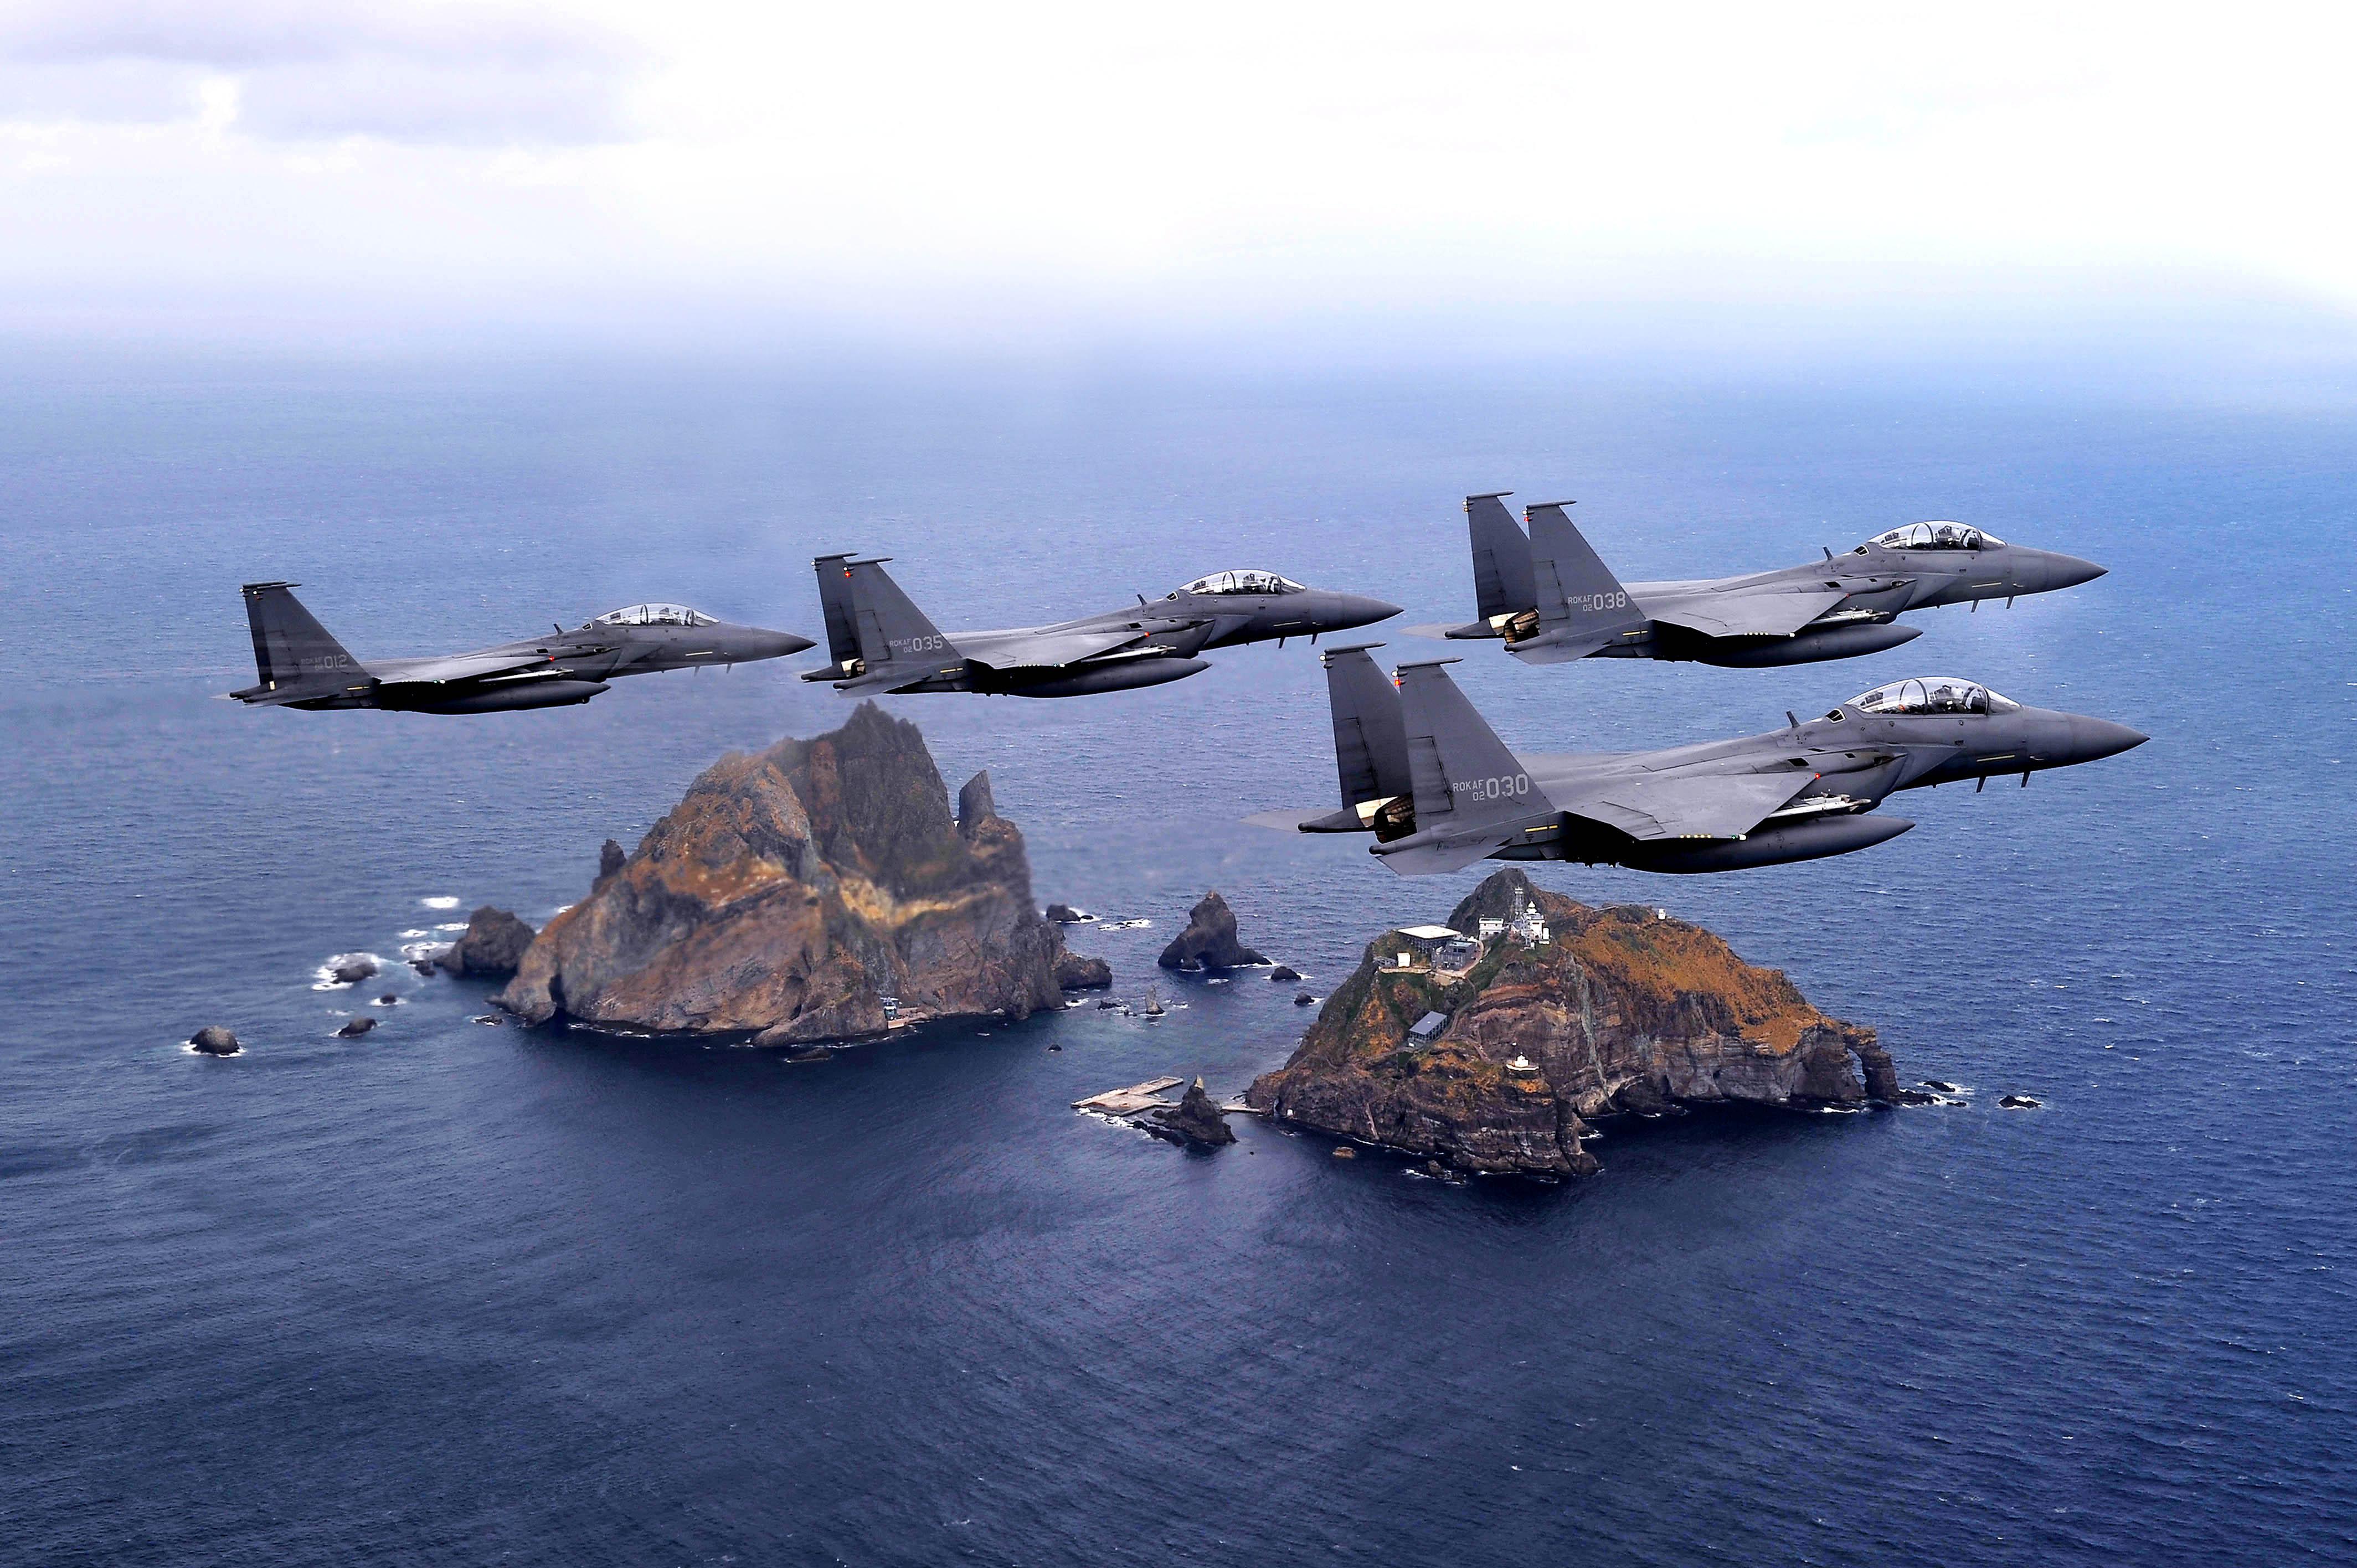 2012.11.10_eb8c80ed959cebafbceab5ad_eab3b5eab5b0_rep.of_korea_air_force_28818381914529